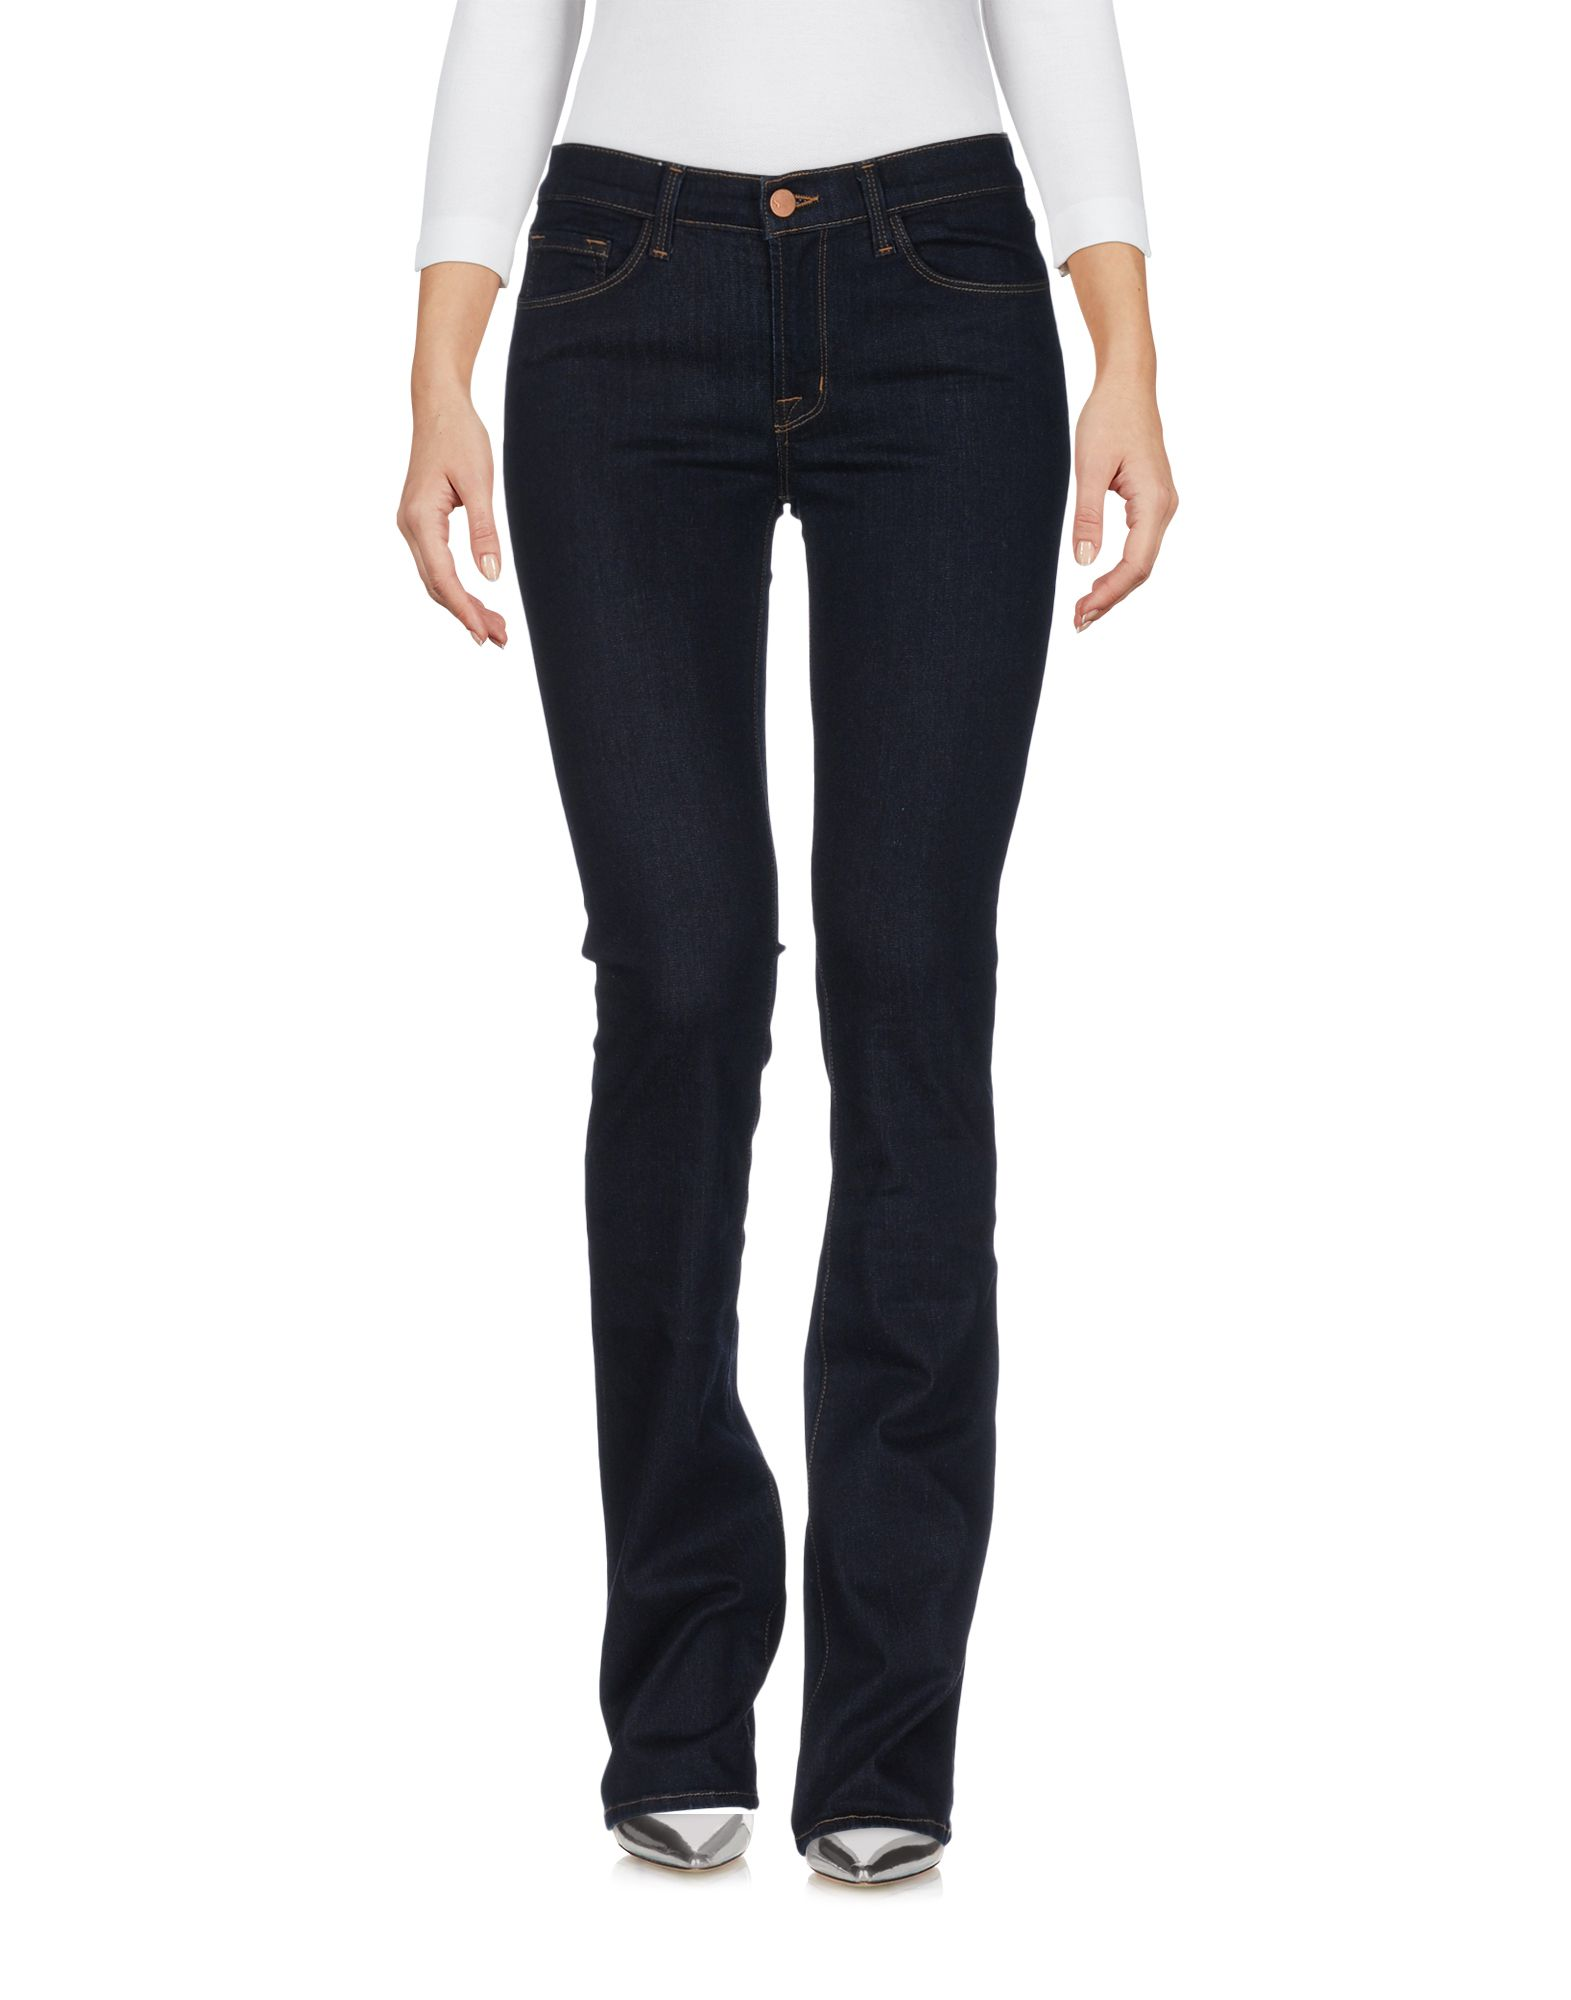 Pantaloni Jeans J Brand Donna - Acquista online su